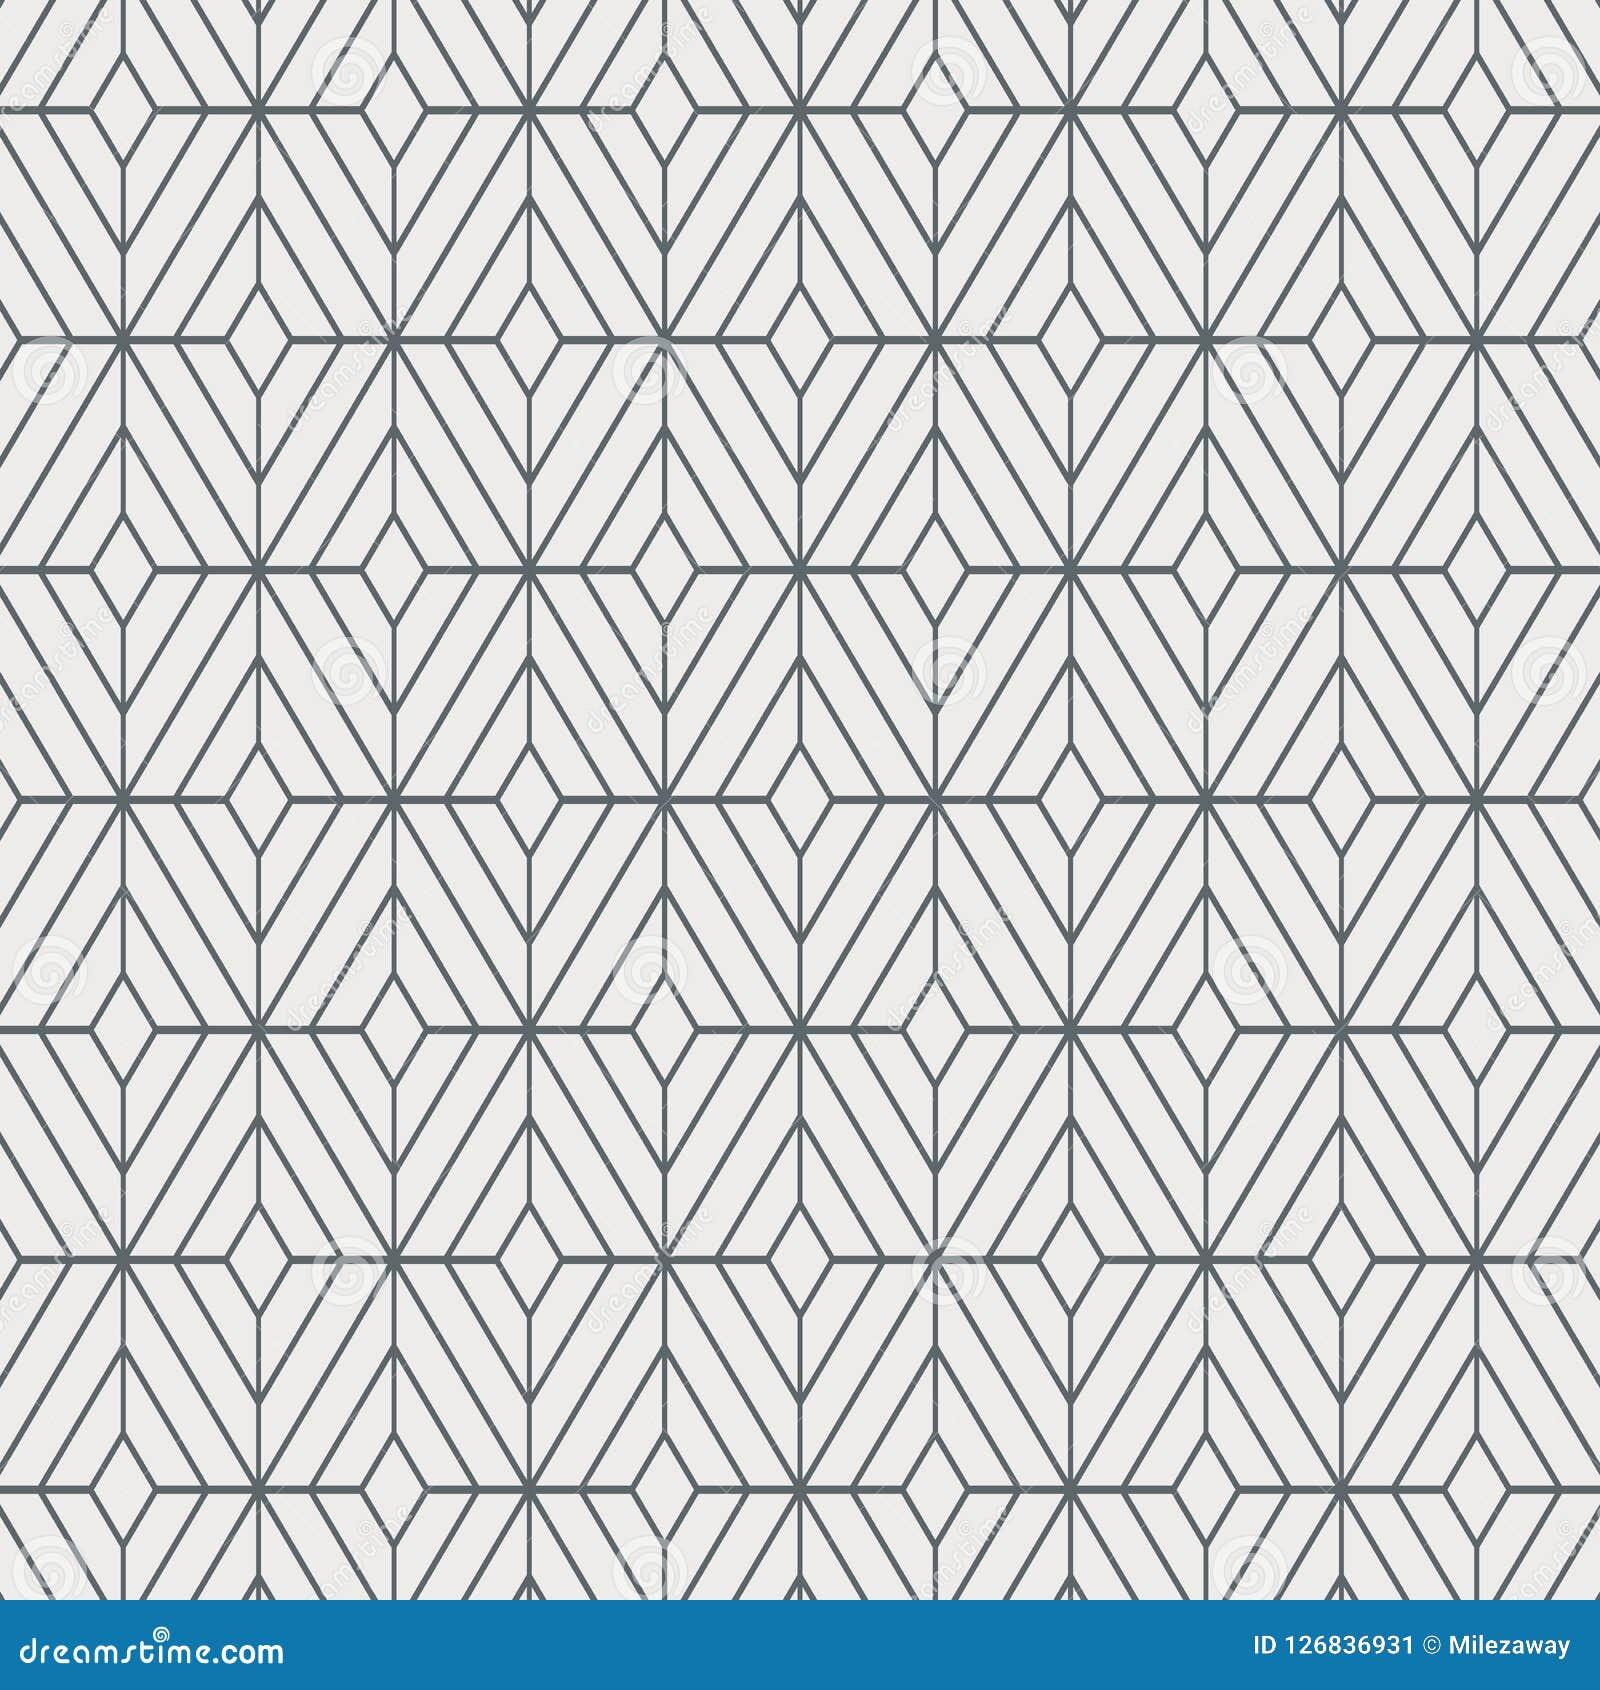 Geometrisk dekorvektormodell som upprepar fyrkantig diamantform, stilfull monokrom